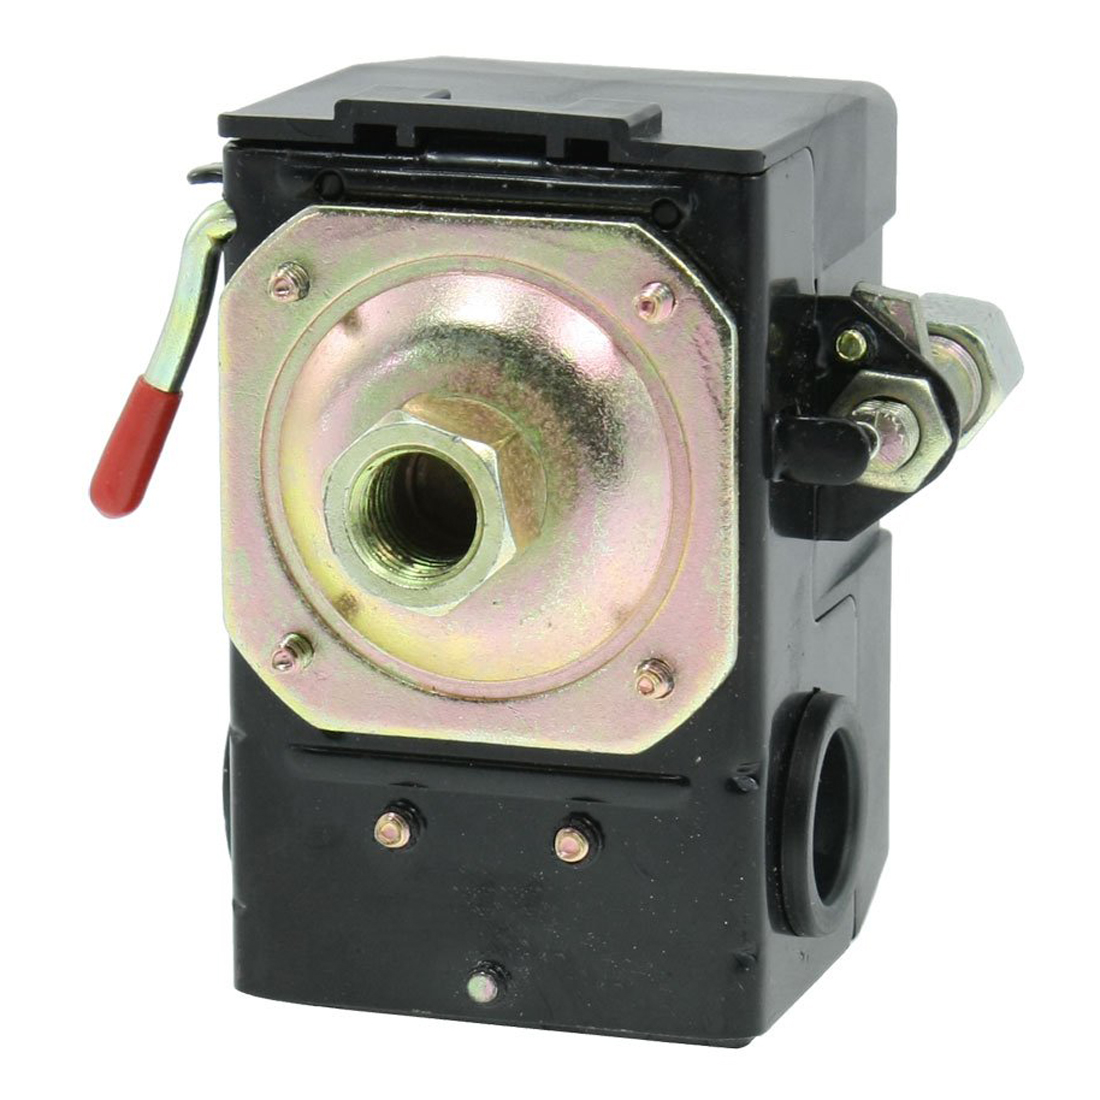 80-115PSI 1/4 NPT 1-Port Air Compressor Pressure Switch Control Valve vertical type replacement part 1 port spdt air compressor pump pressure on off knob switch control valve 80 115 psi ac220 240v